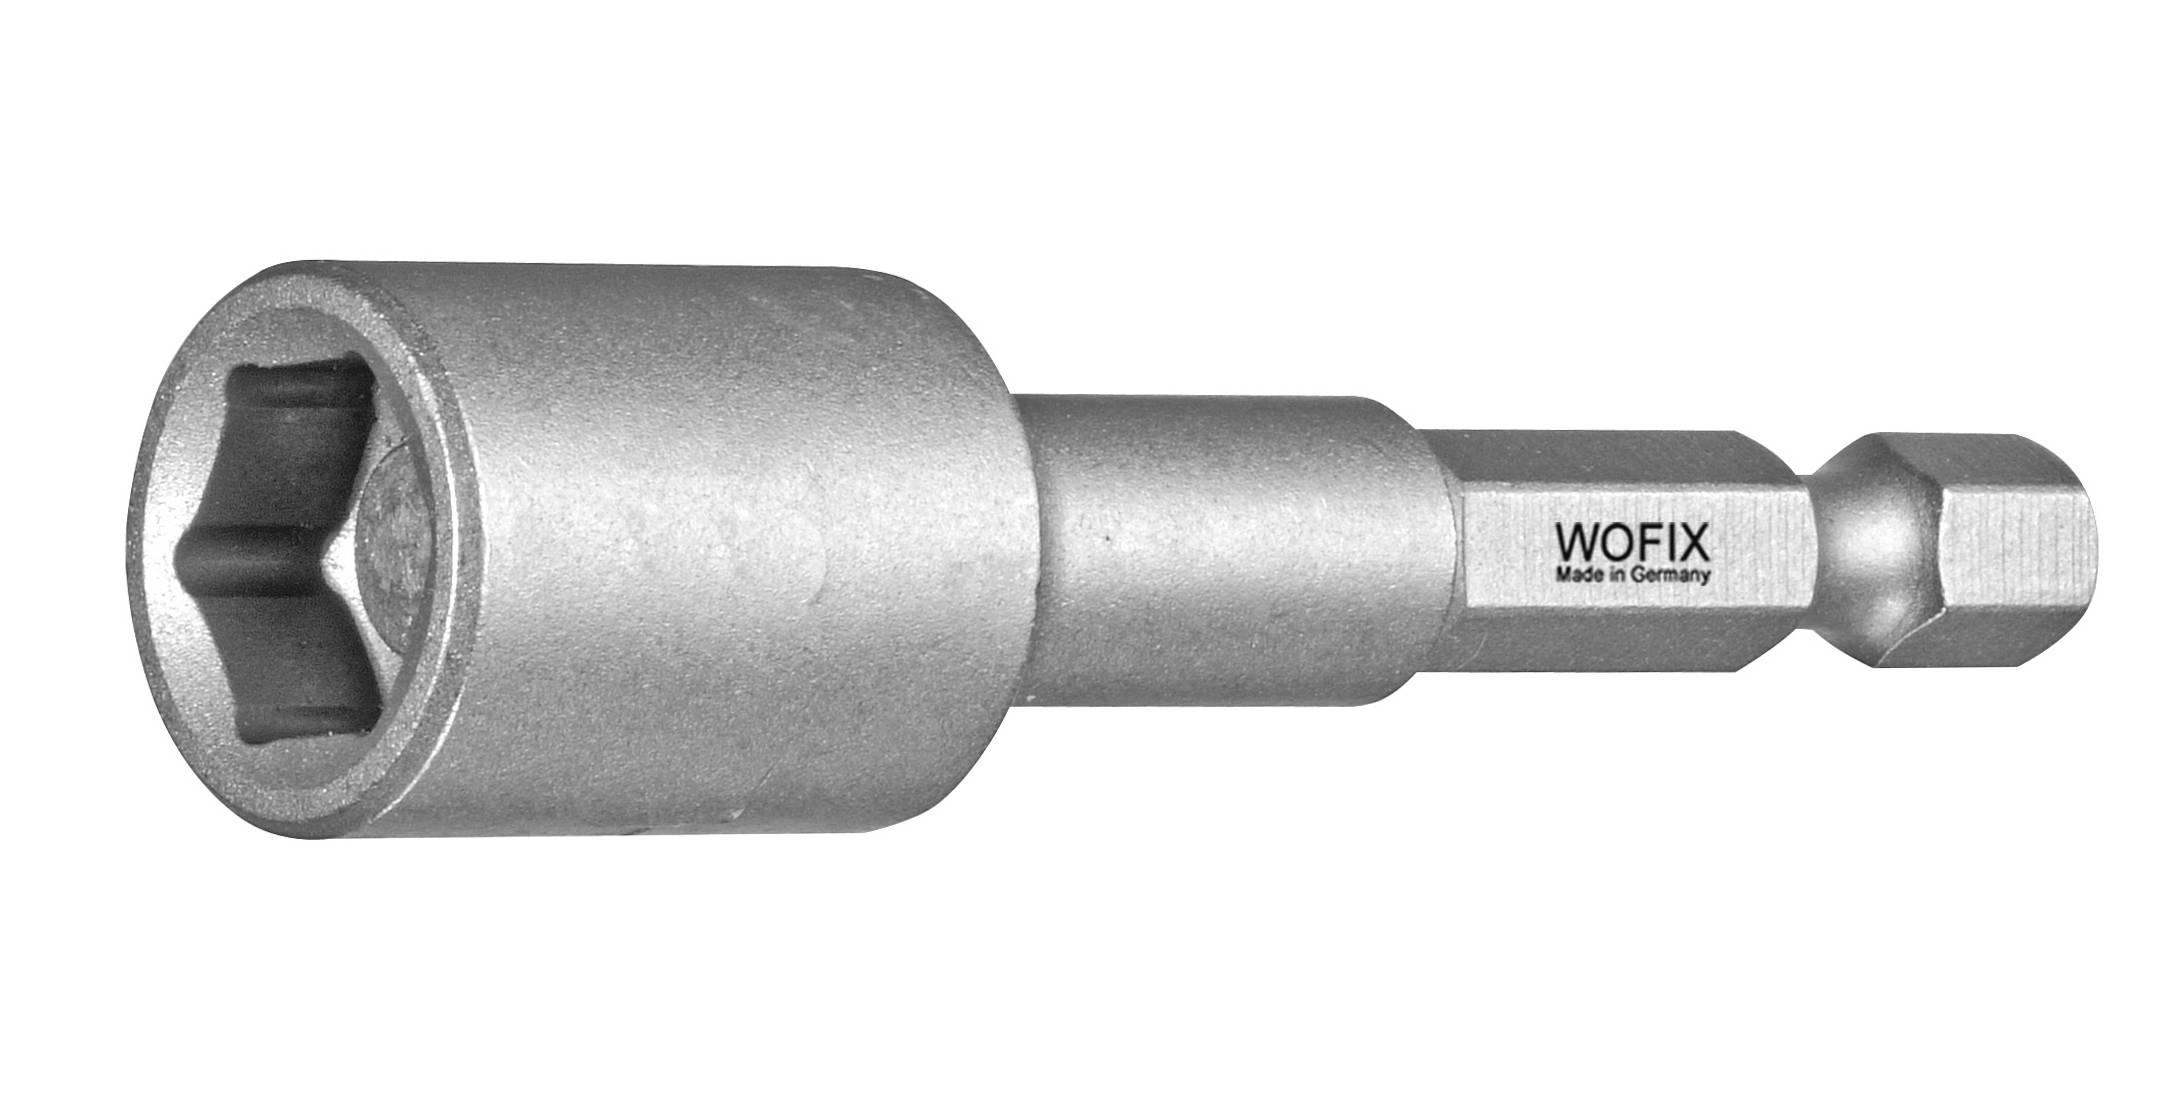 Wofix 7358080 Professional standard Dopbit - SW8,0 50 mm